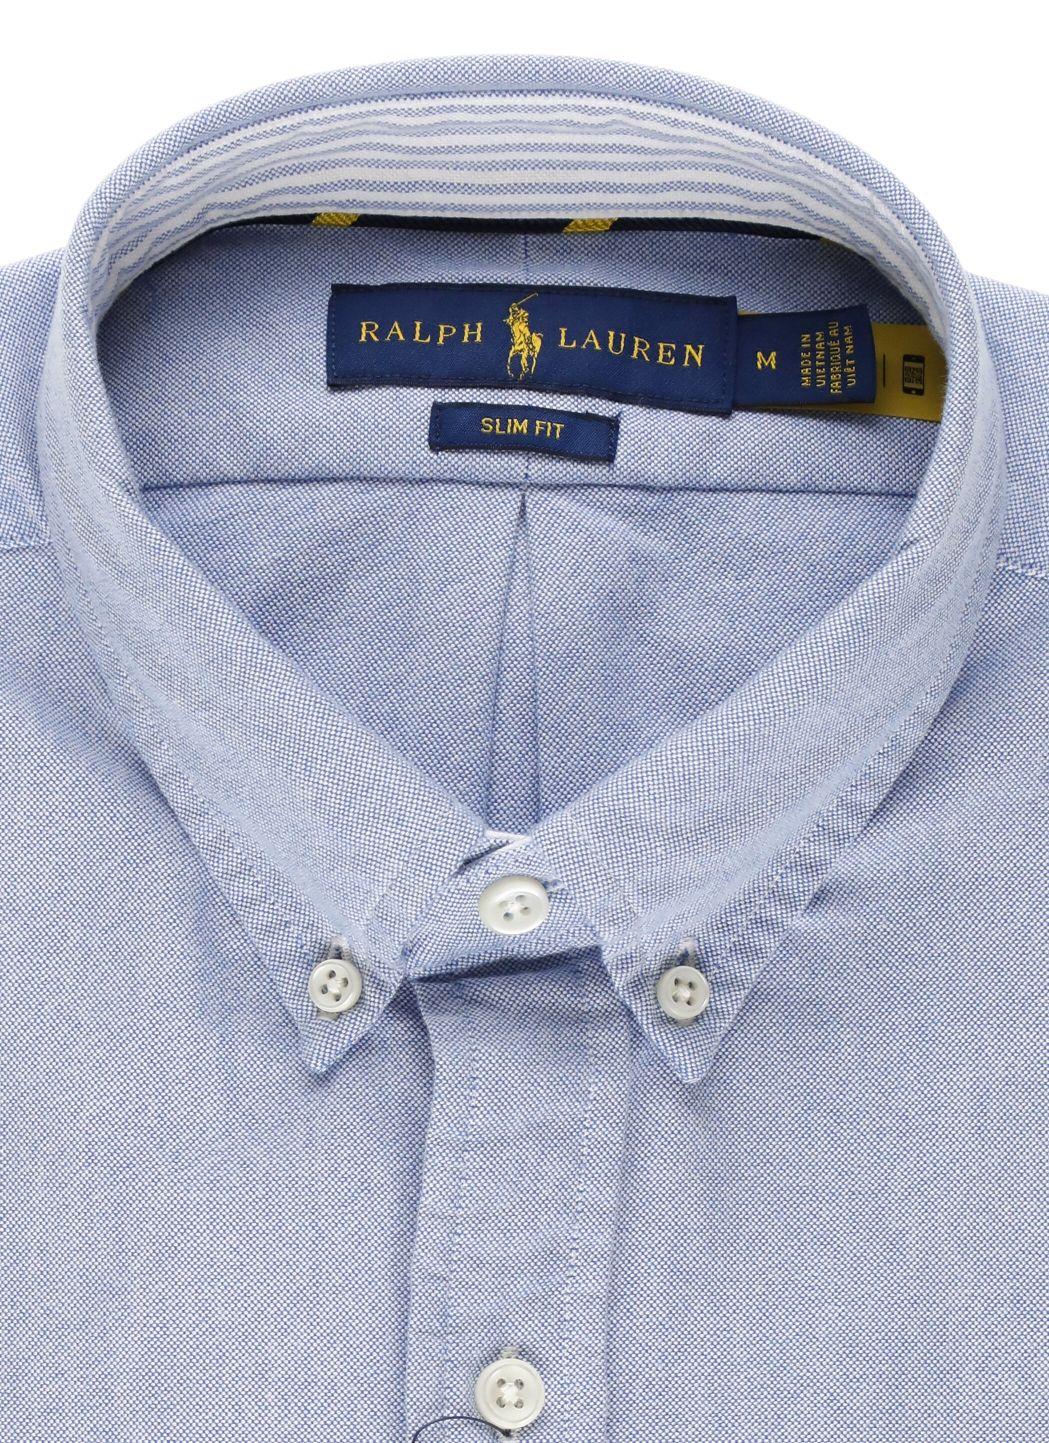 Camicia con logo